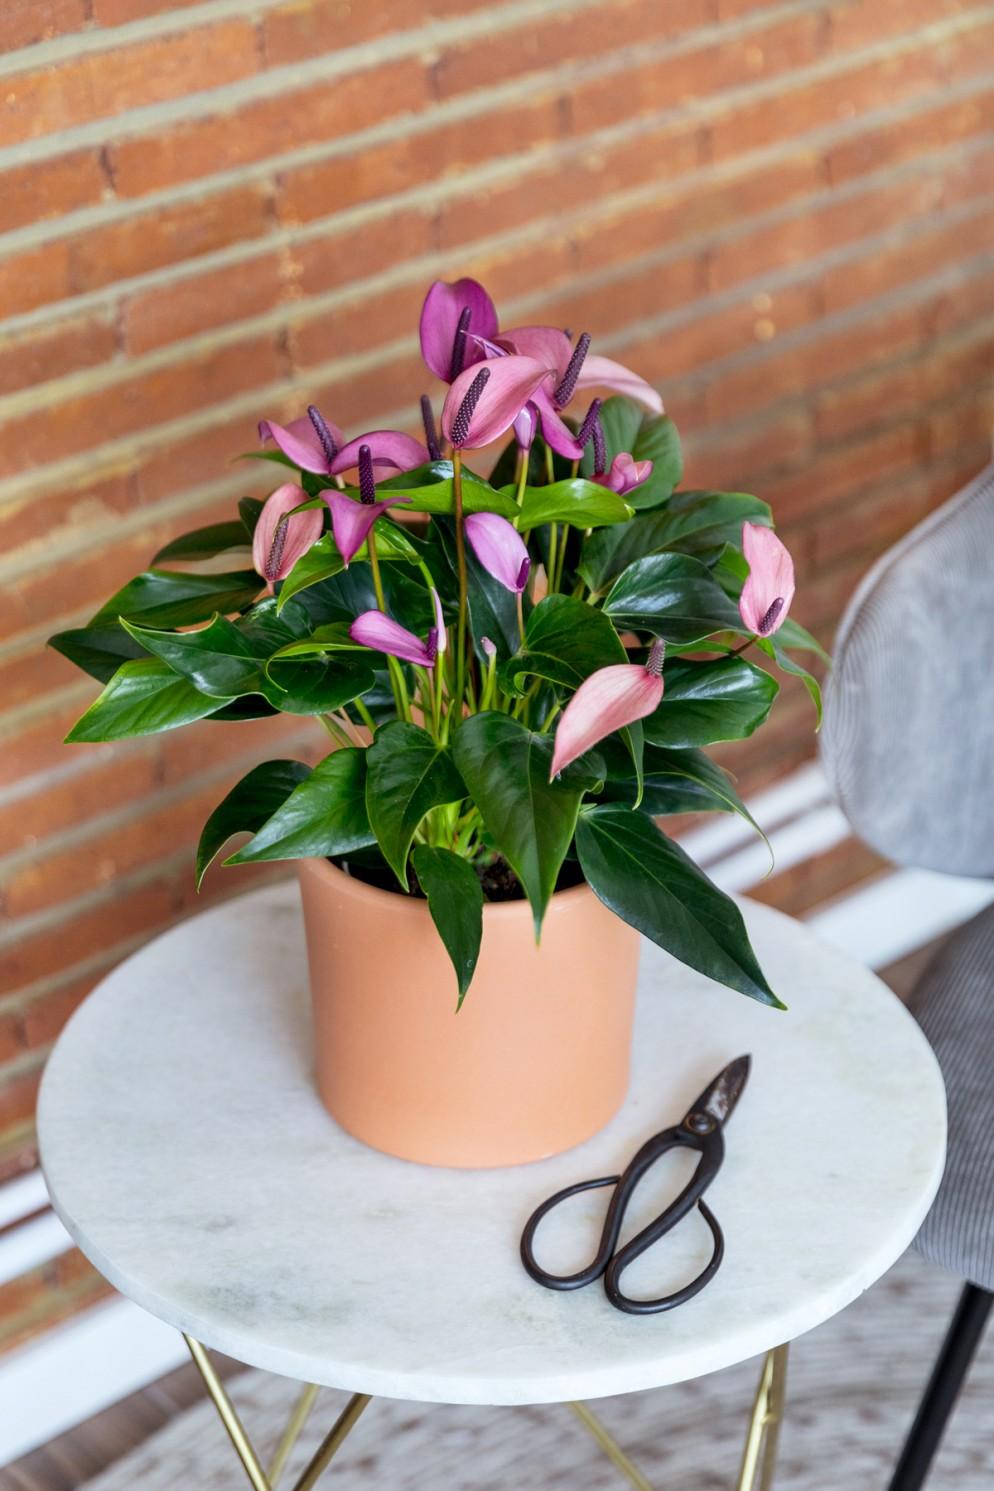 piante-da-interno-7.-thecolvinco.com-Lilac-(2)-living-corriere